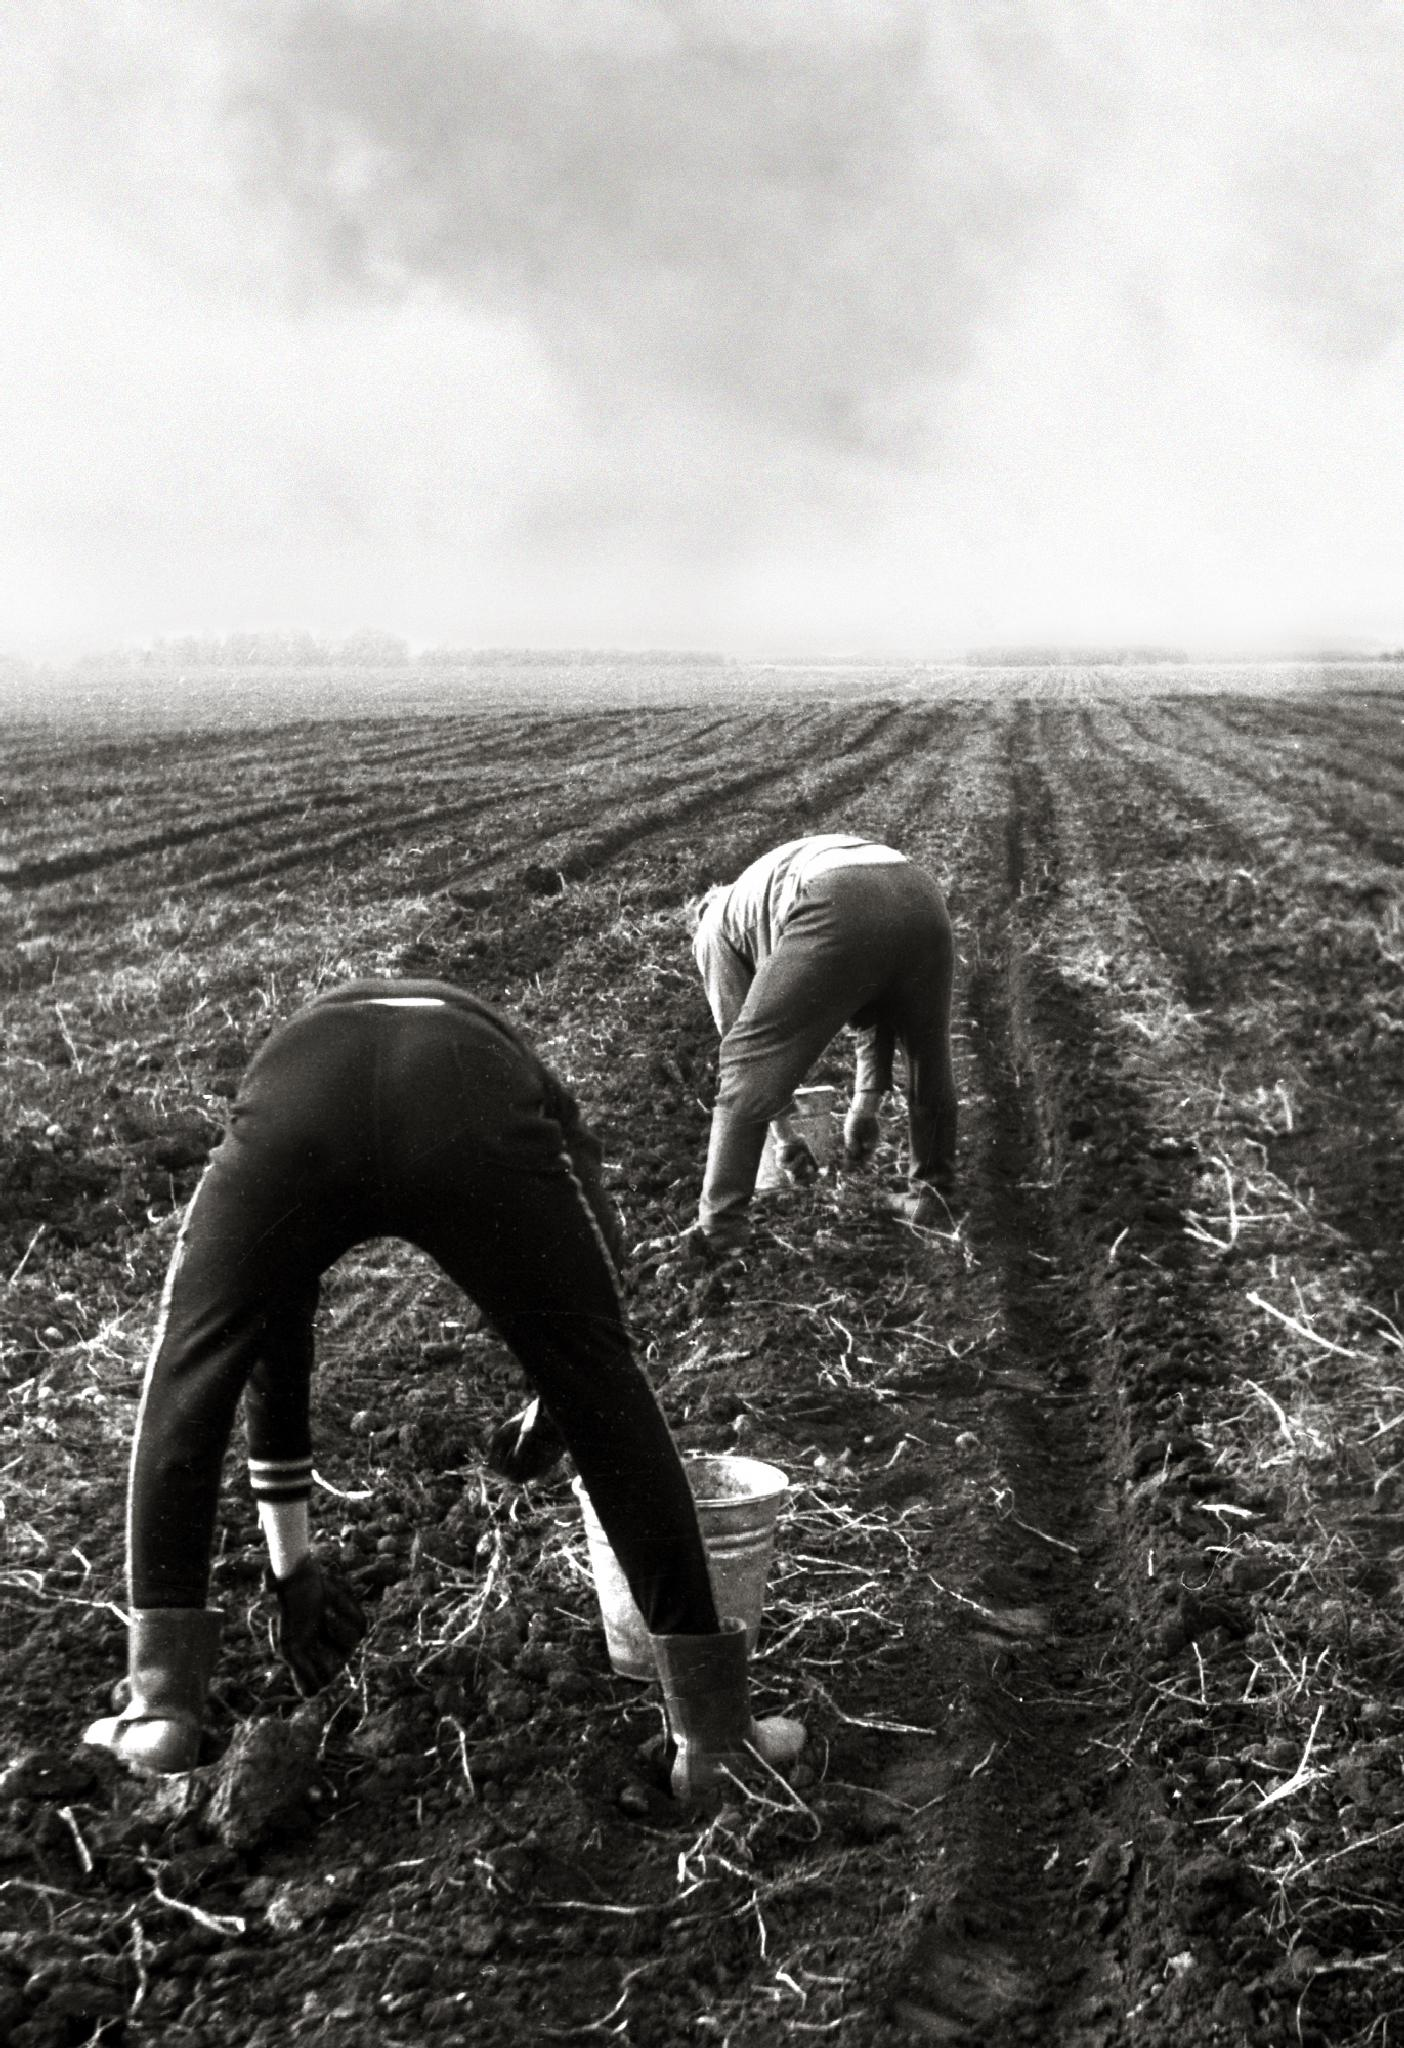 Soviet students and potato harvest by Сергей Юрьев